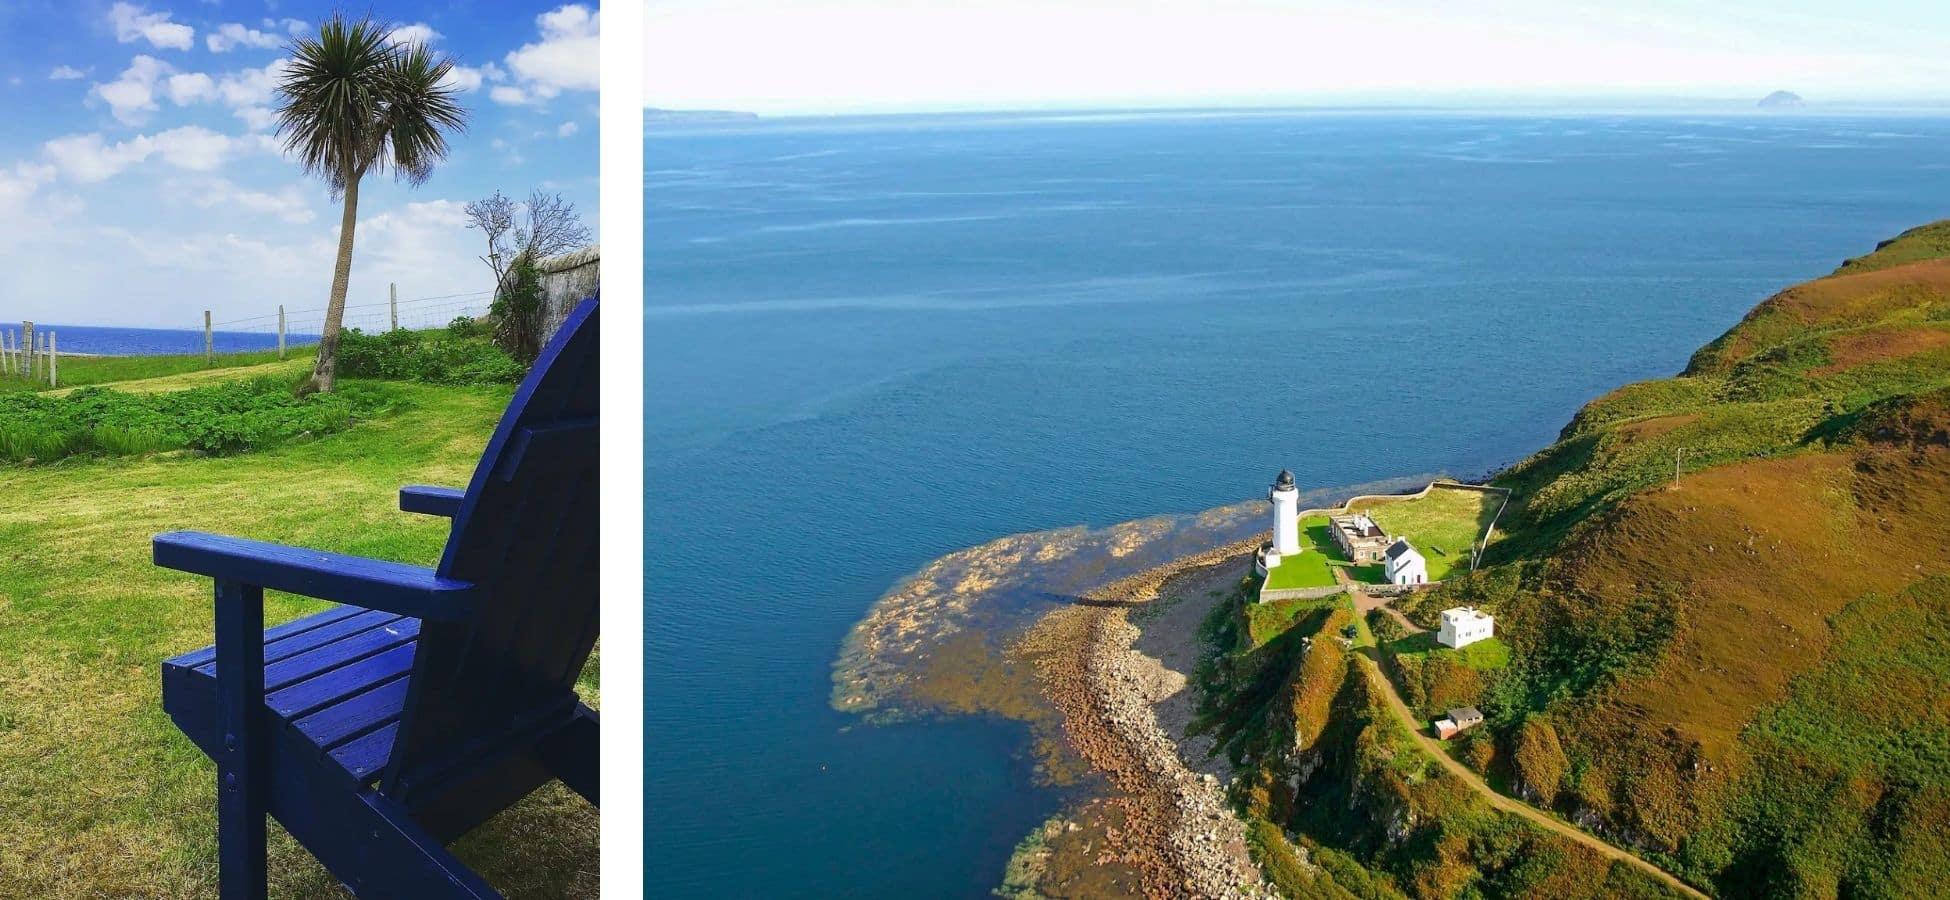 Joli îlot écossais